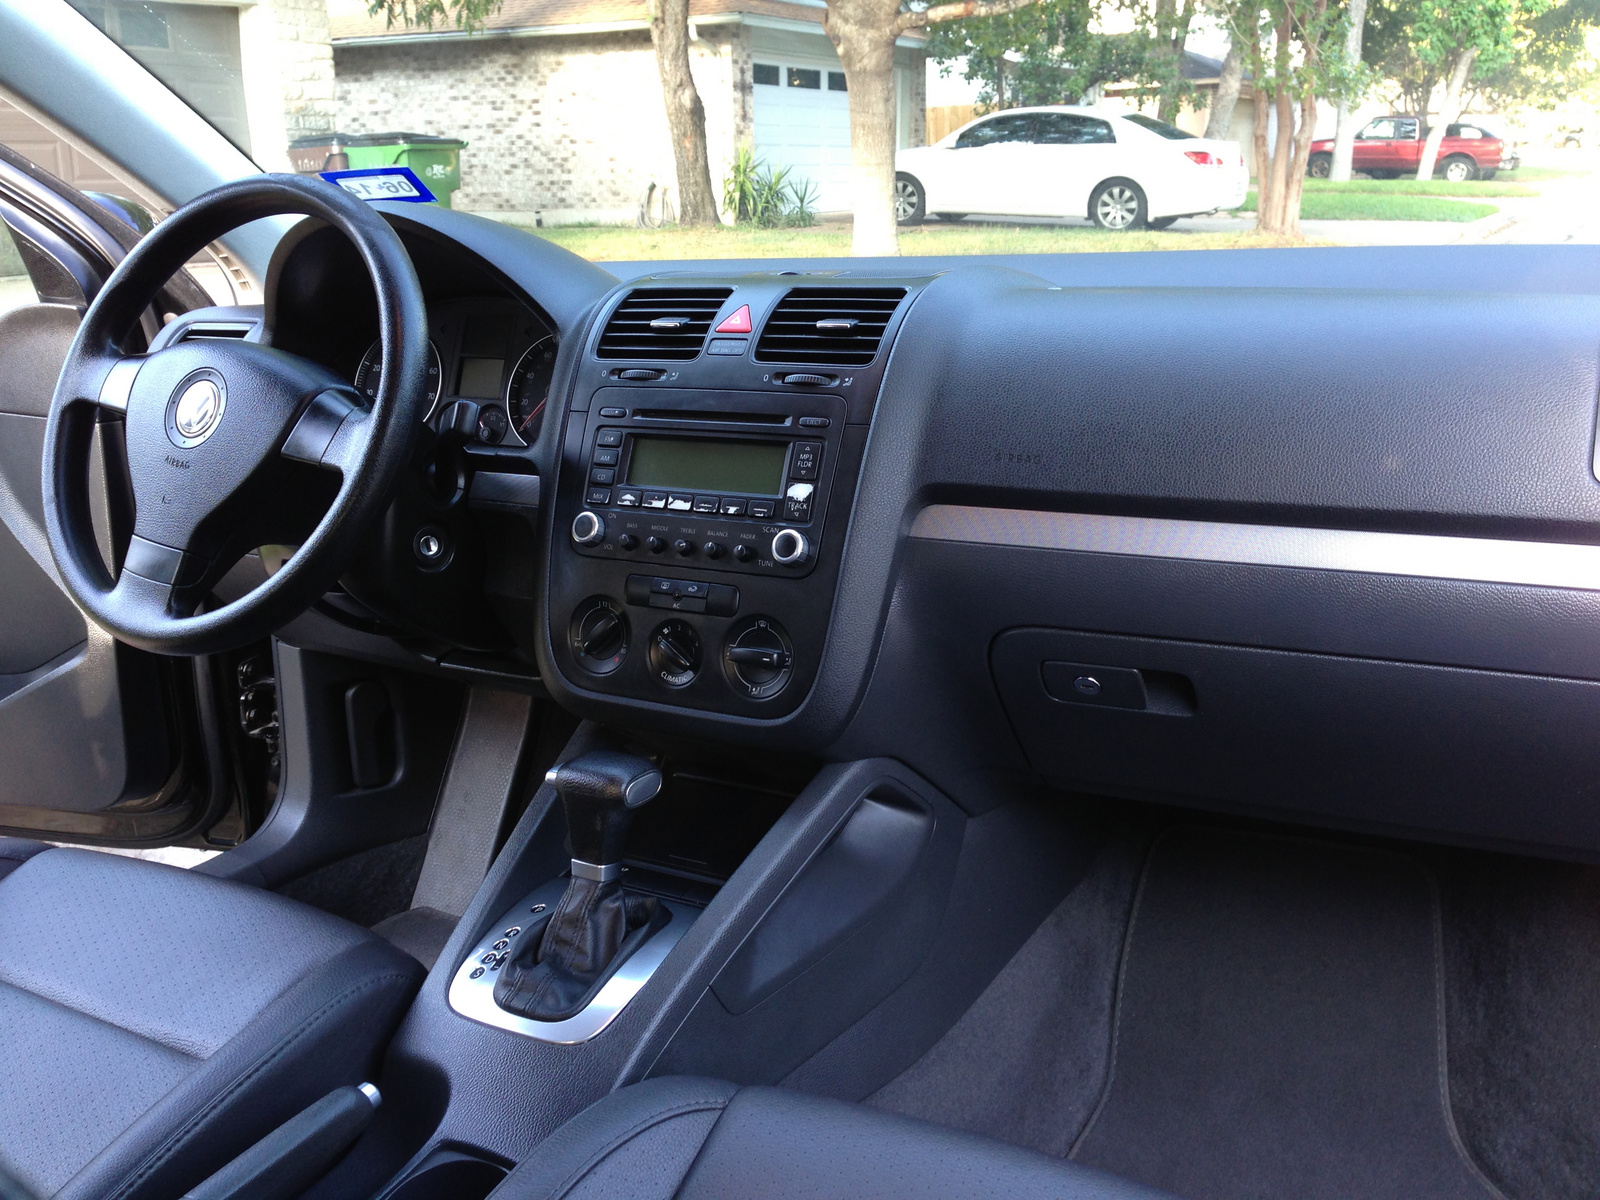 2006 Volkswagen Jetta - Interior Pictures - CarGurus